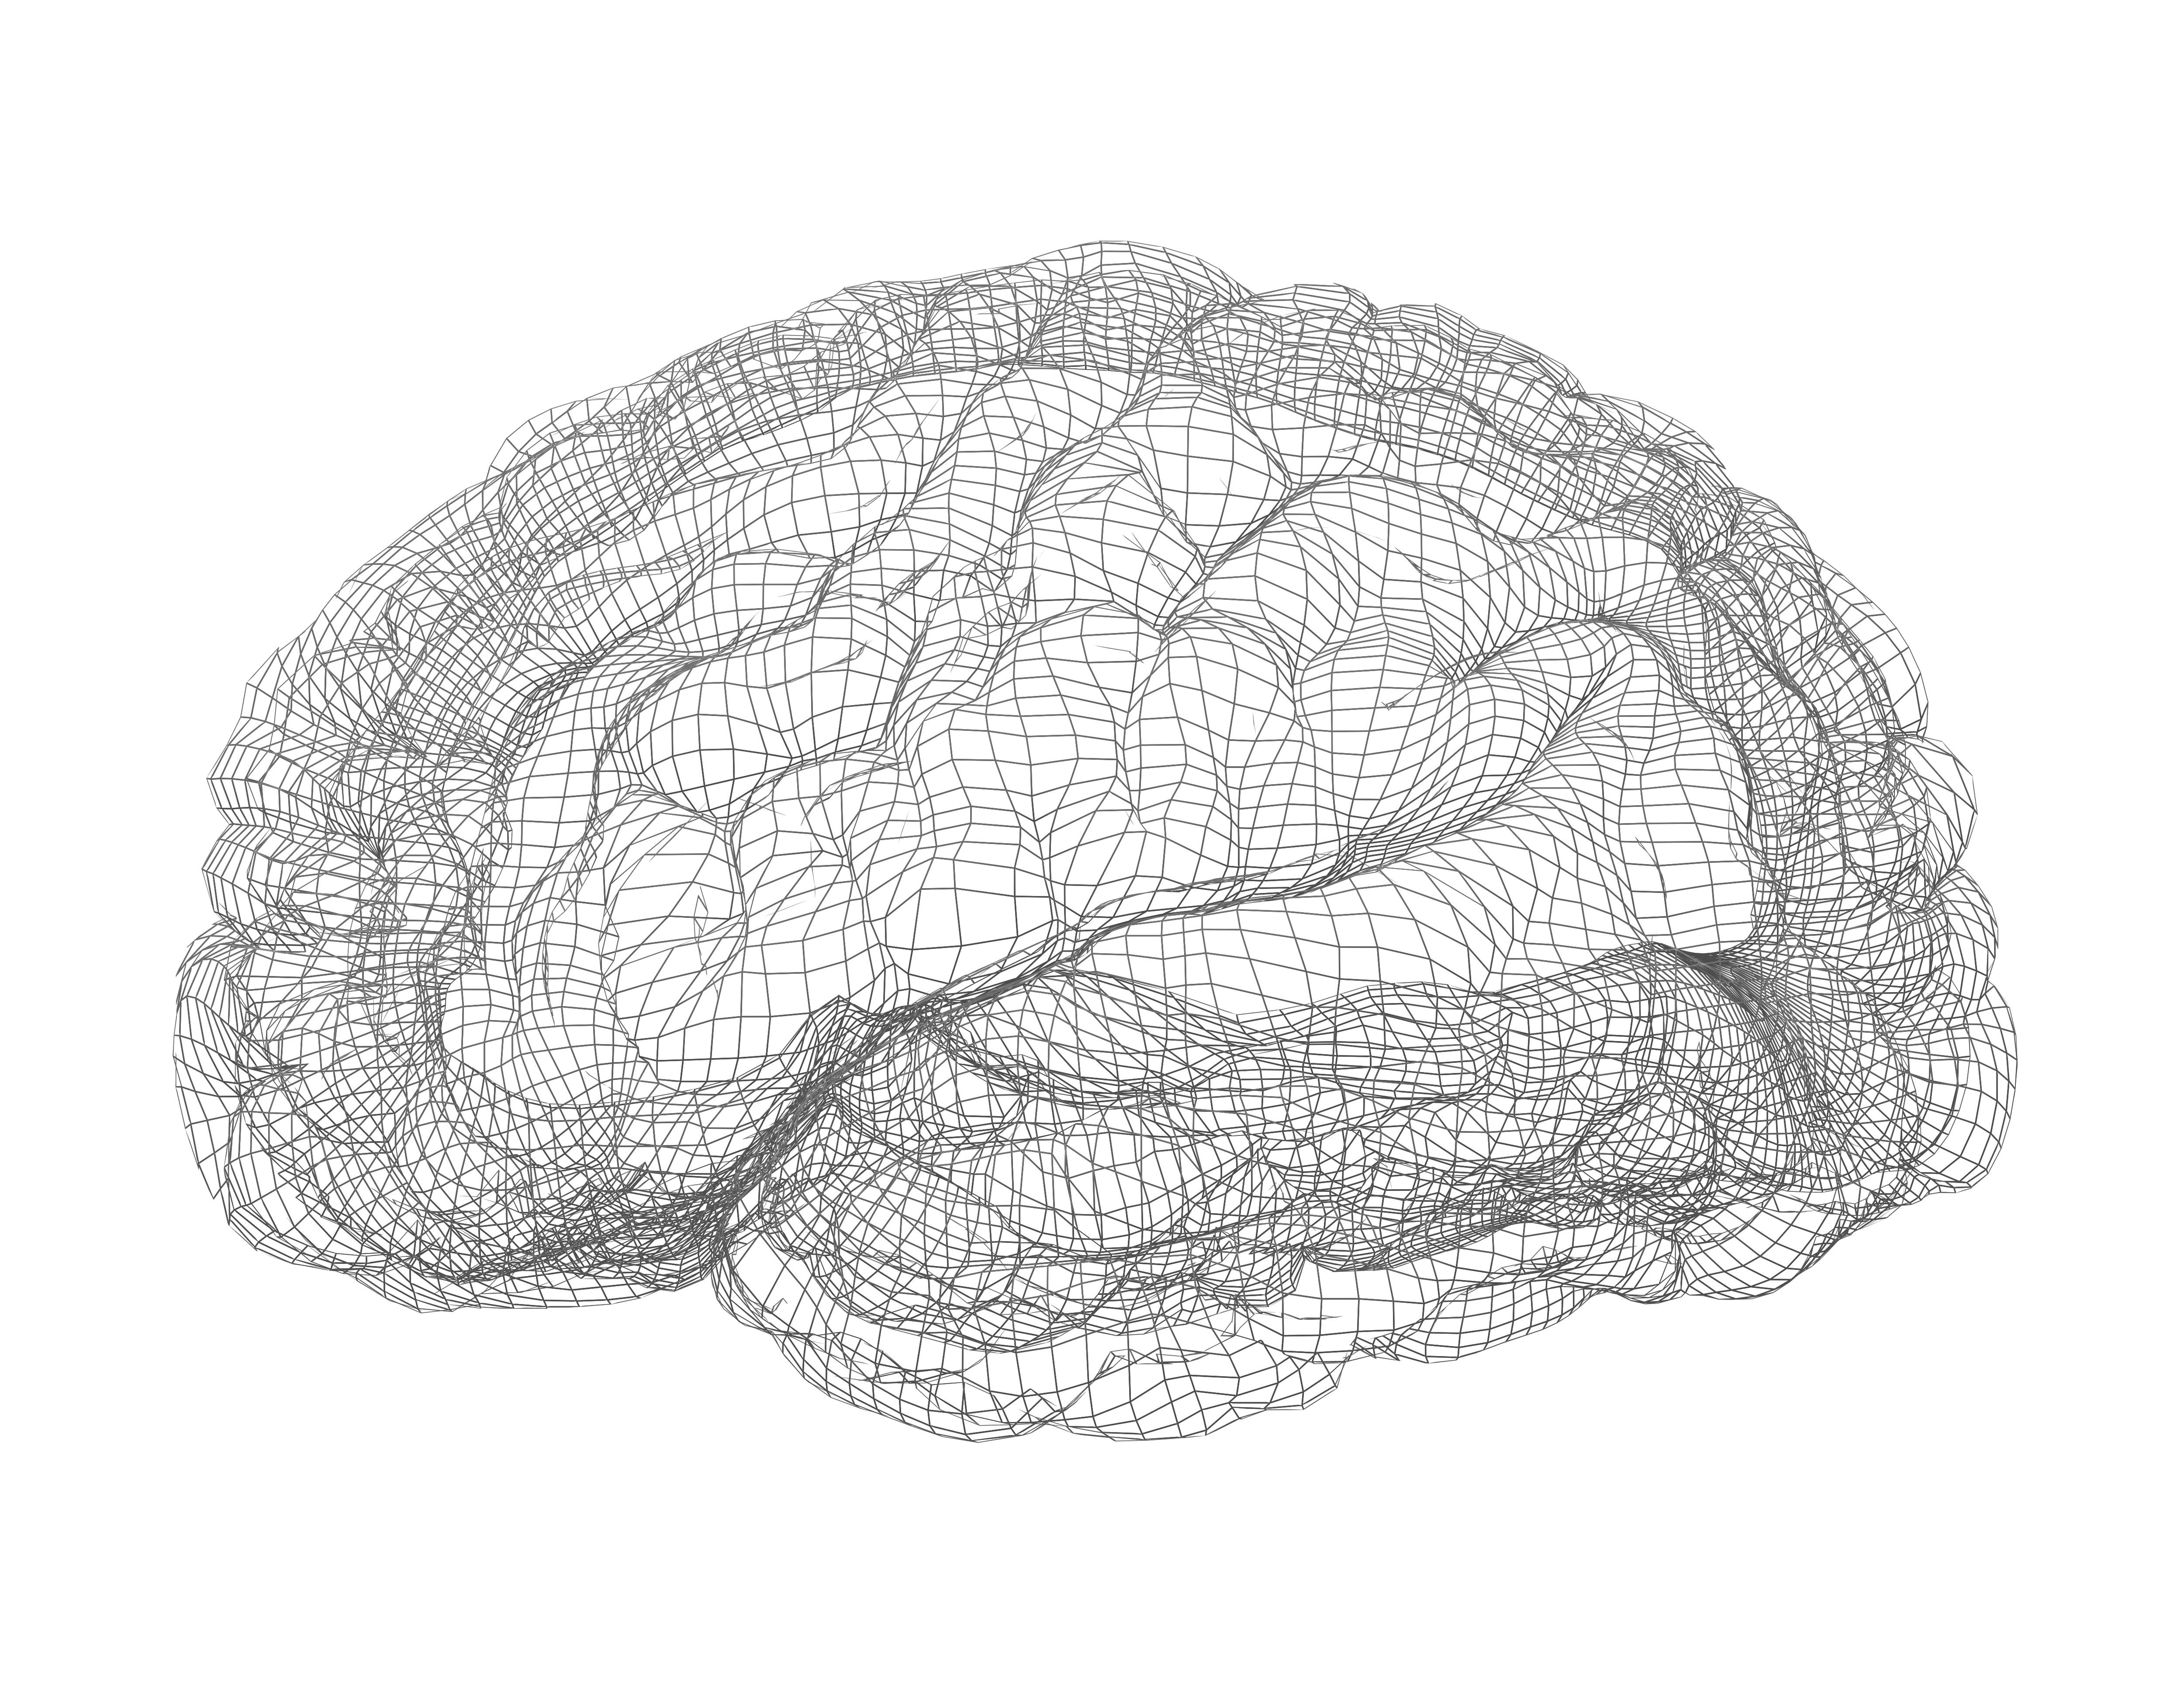 The Lieber Institute for Brain Development Establishes the World's Largest Posttraumatic Stress Disorder Postmortem Brain Repository